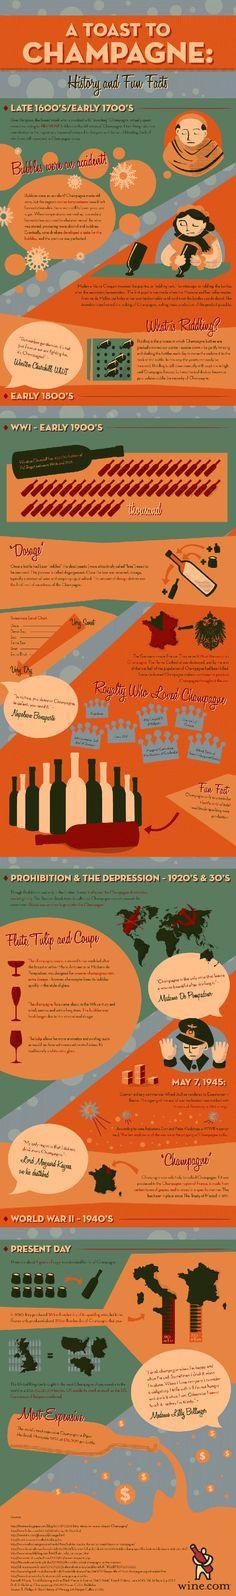 Toast to Champagne: Bir Sampanya Infografigi #infographic